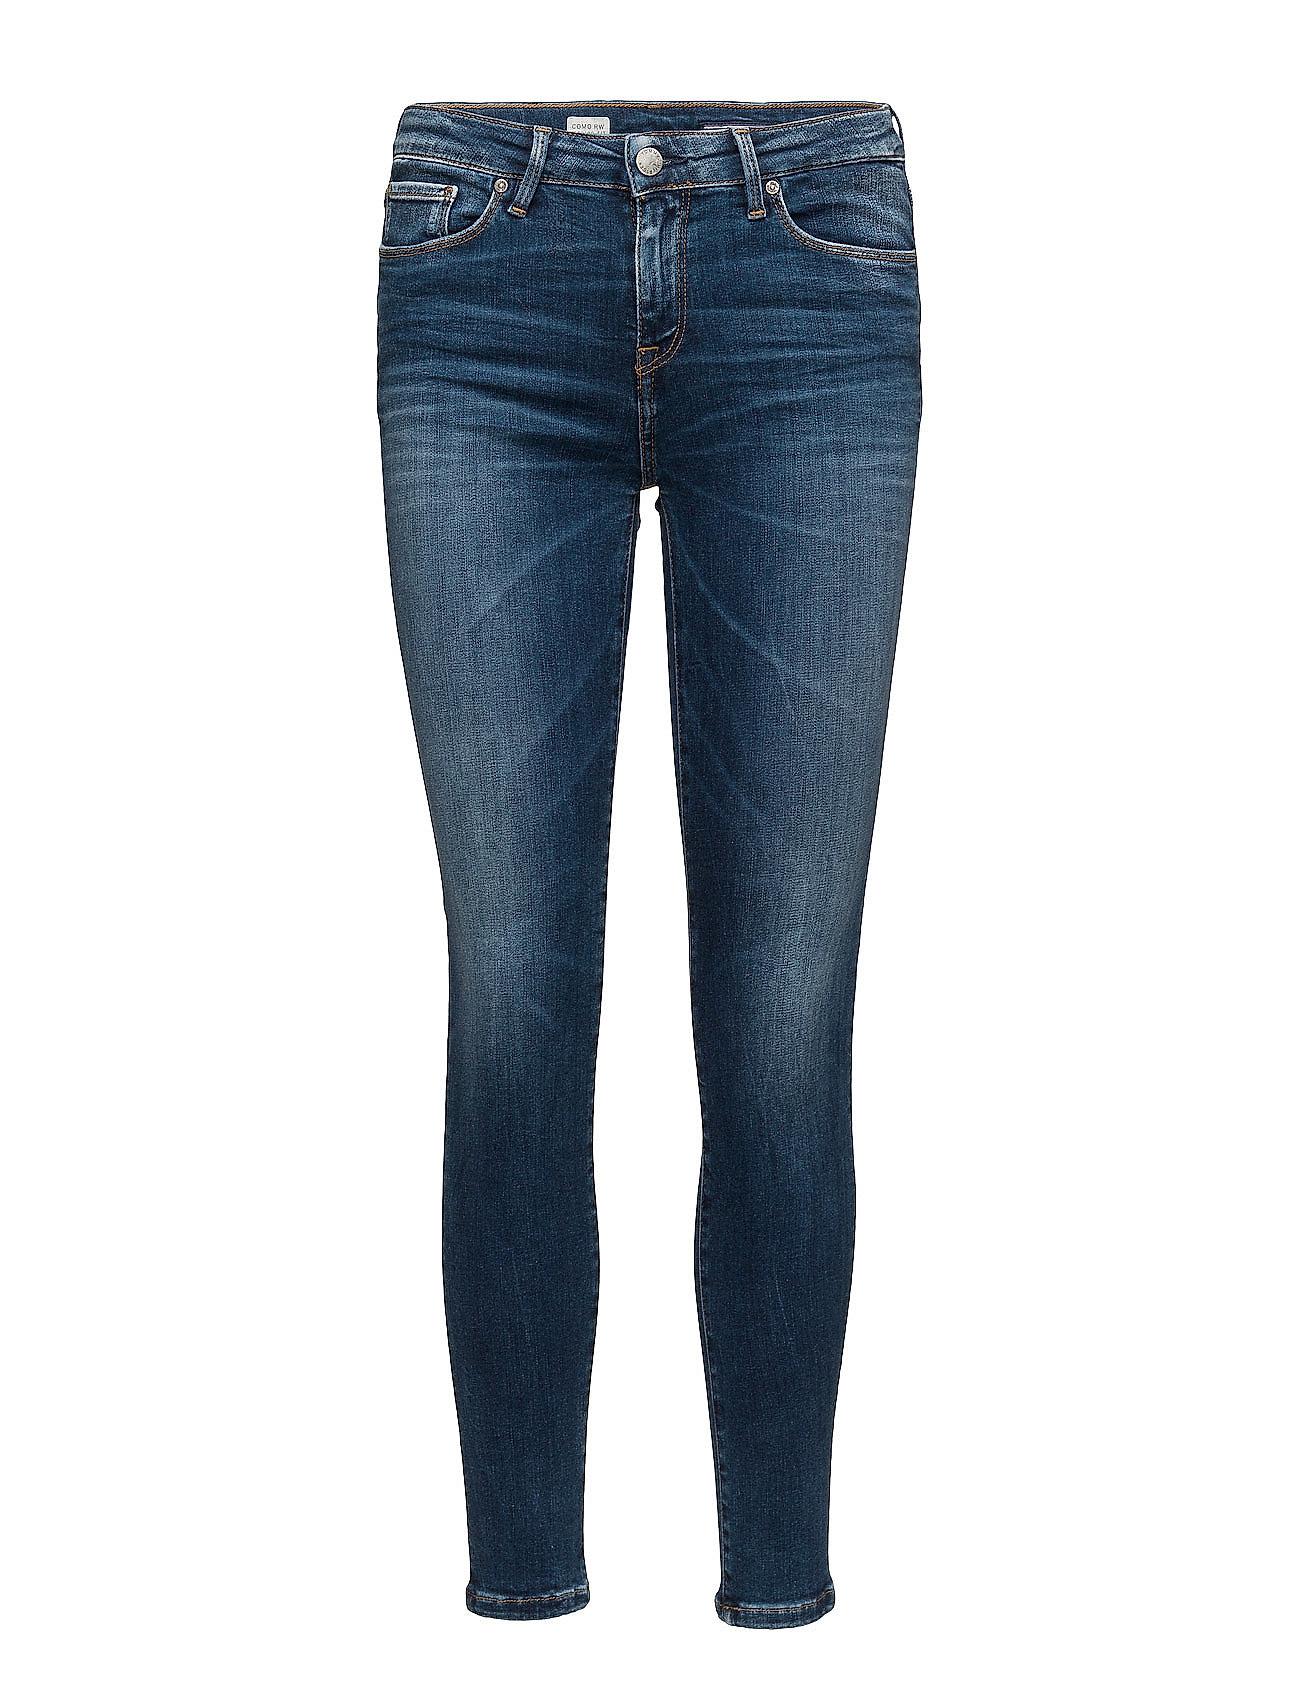 Tommy Hilfiger - HERITAGE COMO SKINNY RW - skinny jeans - doreen - 0